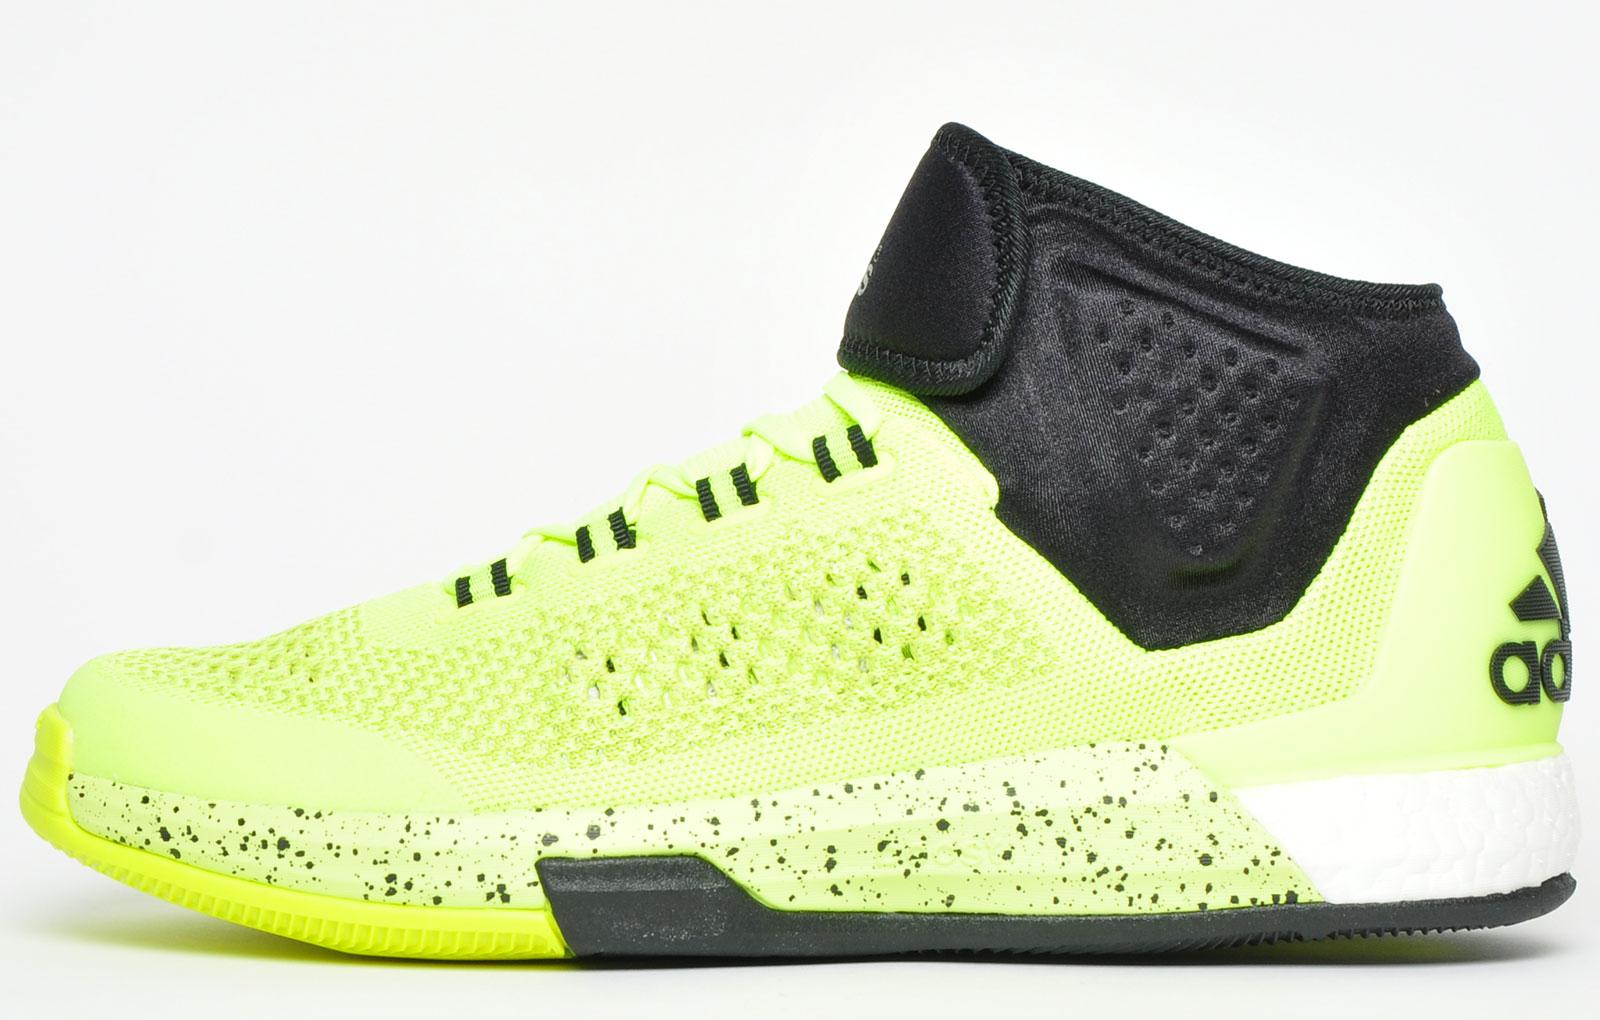 Adidas Crazylight Boost Primeknit Mens -